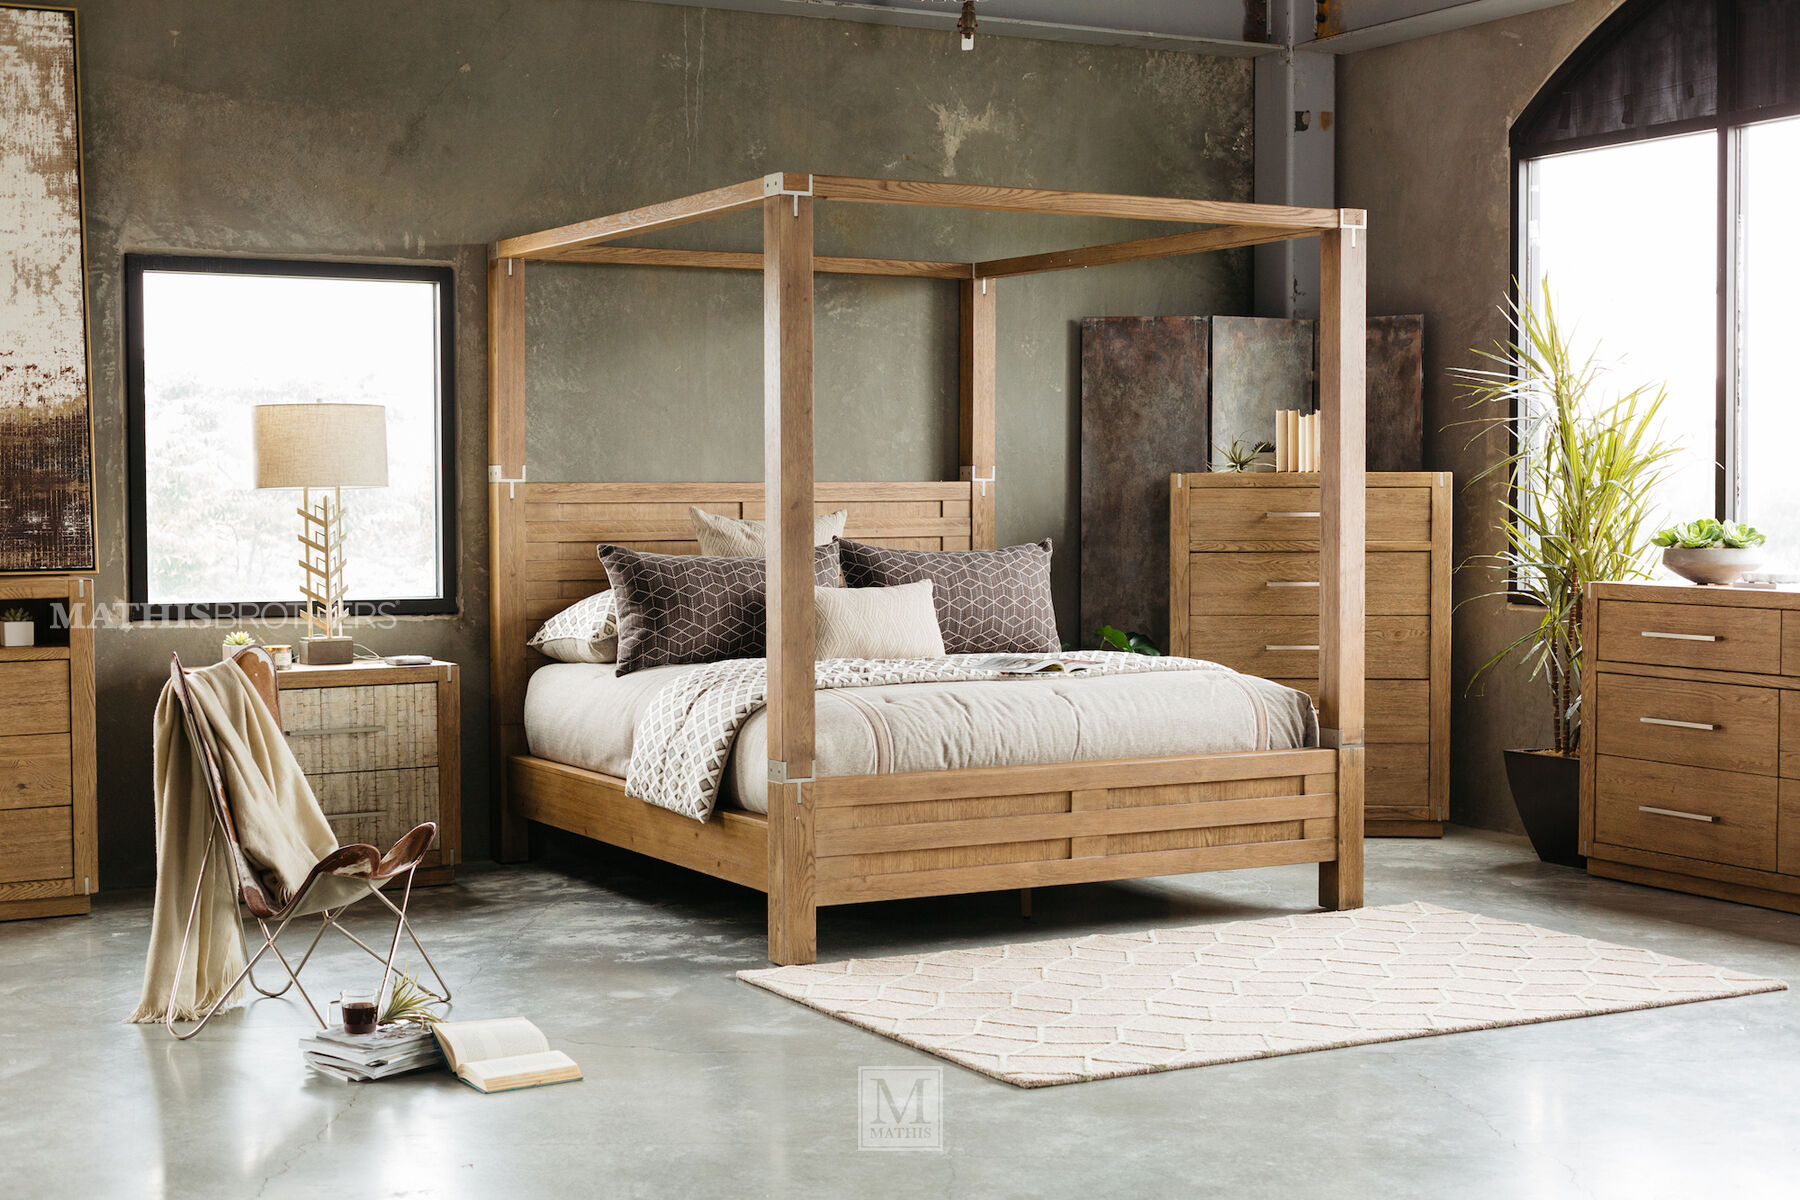 88u0026quot; Modern Interchangeable Panel to Canopy Bed in Rustic Oak & 88